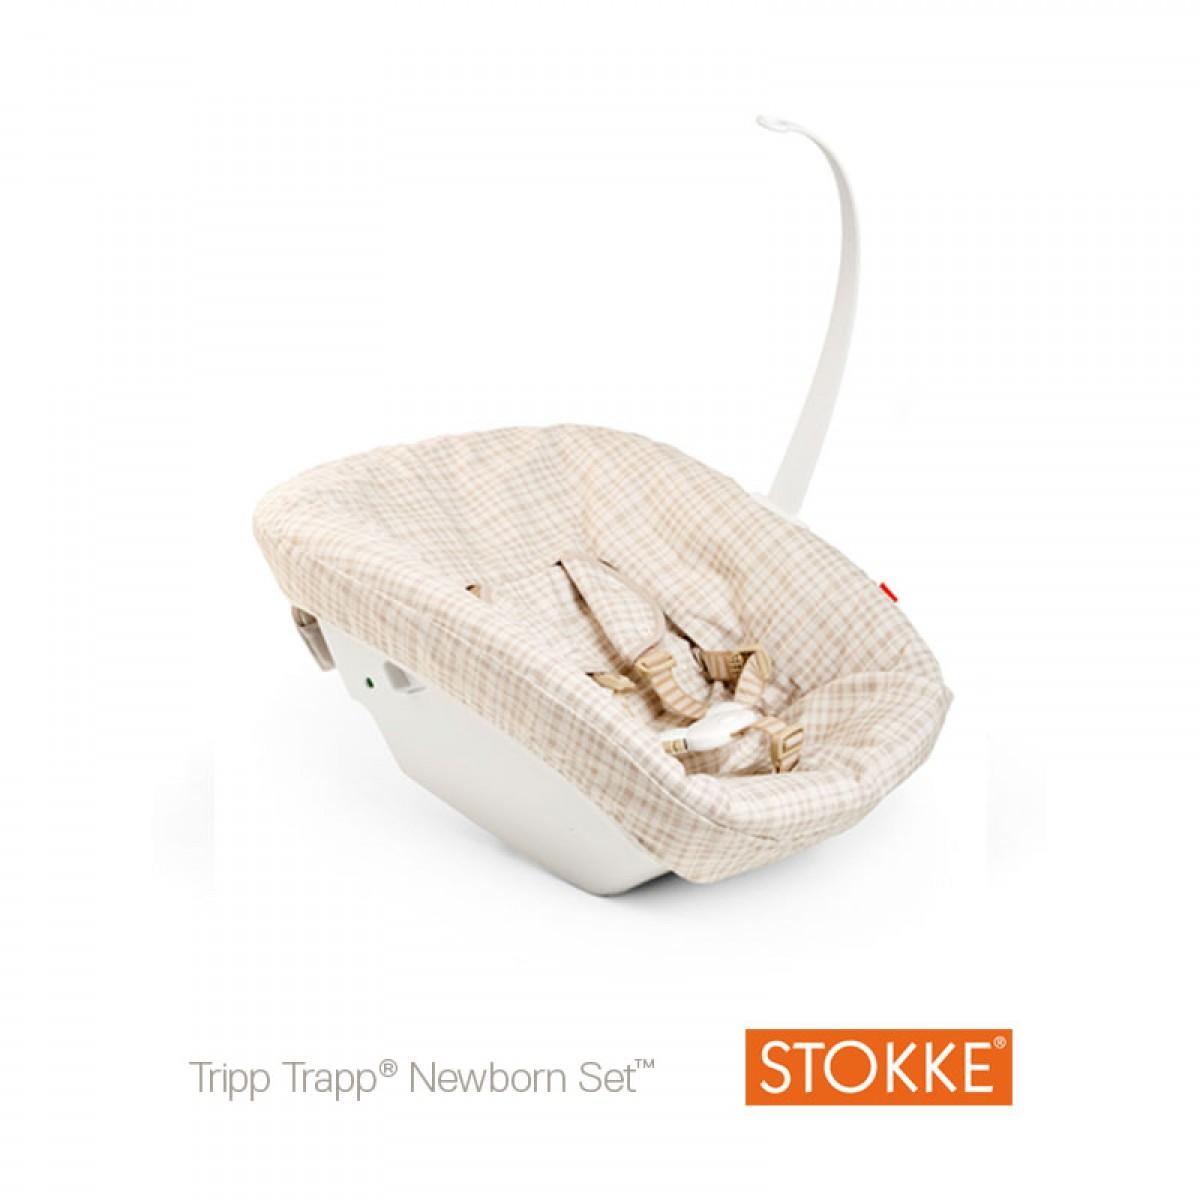 stokketripp trapp new born set. Black Bedroom Furniture Sets. Home Design Ideas